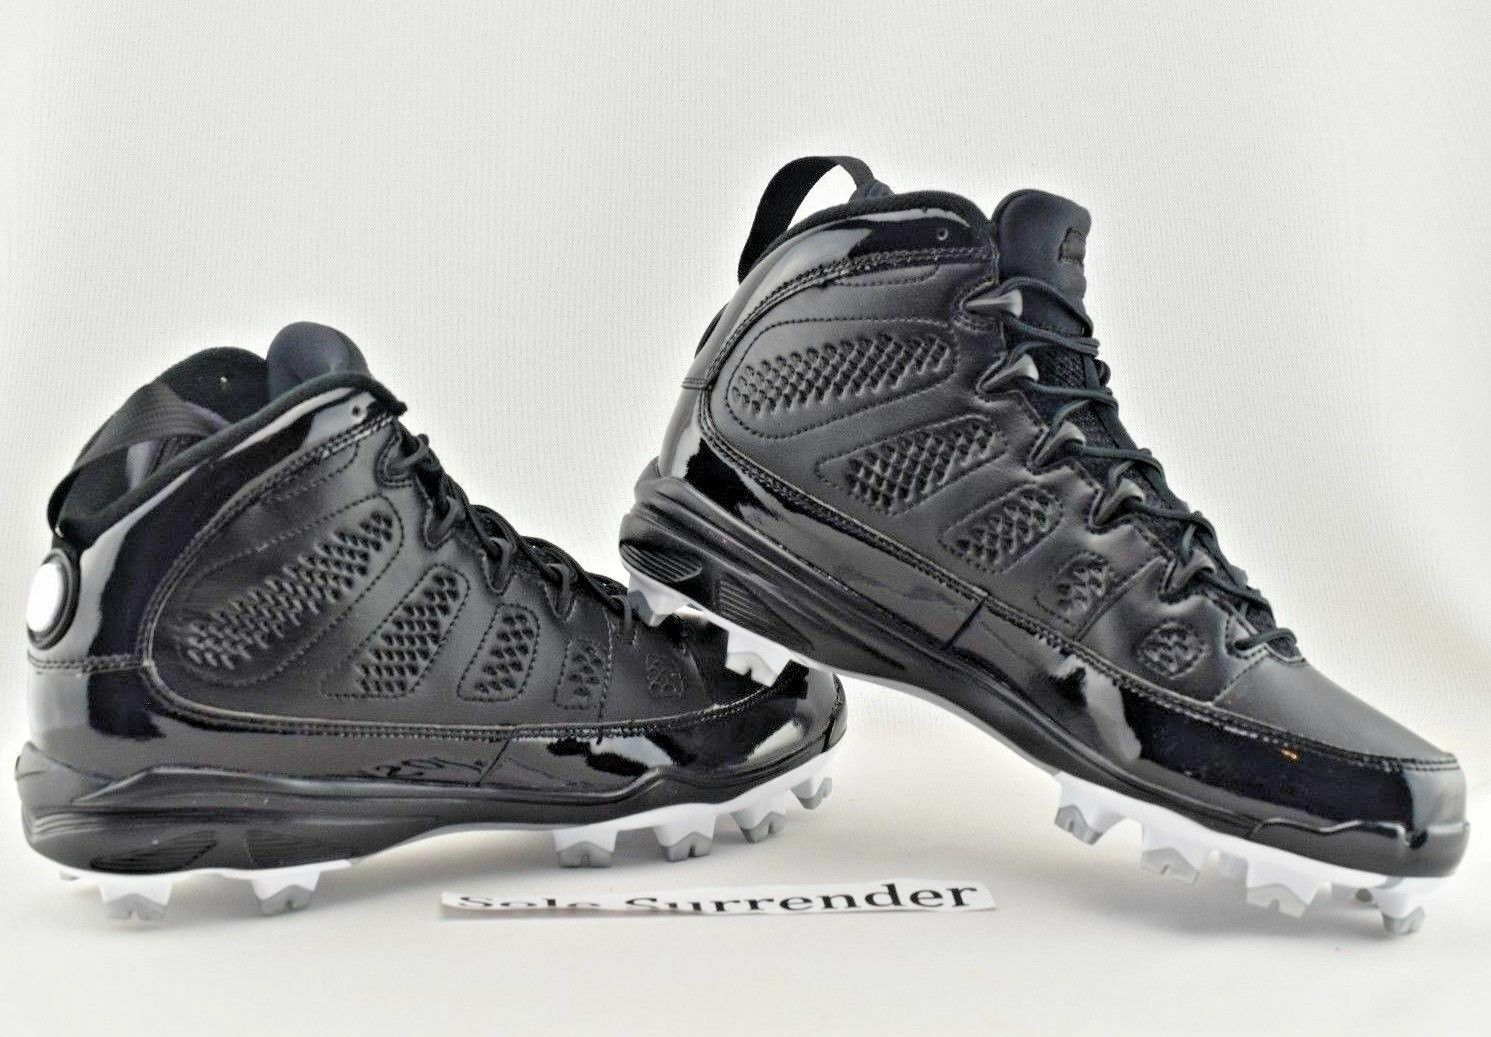 Nike Jordan 9 IX Retro MCS Game Men's